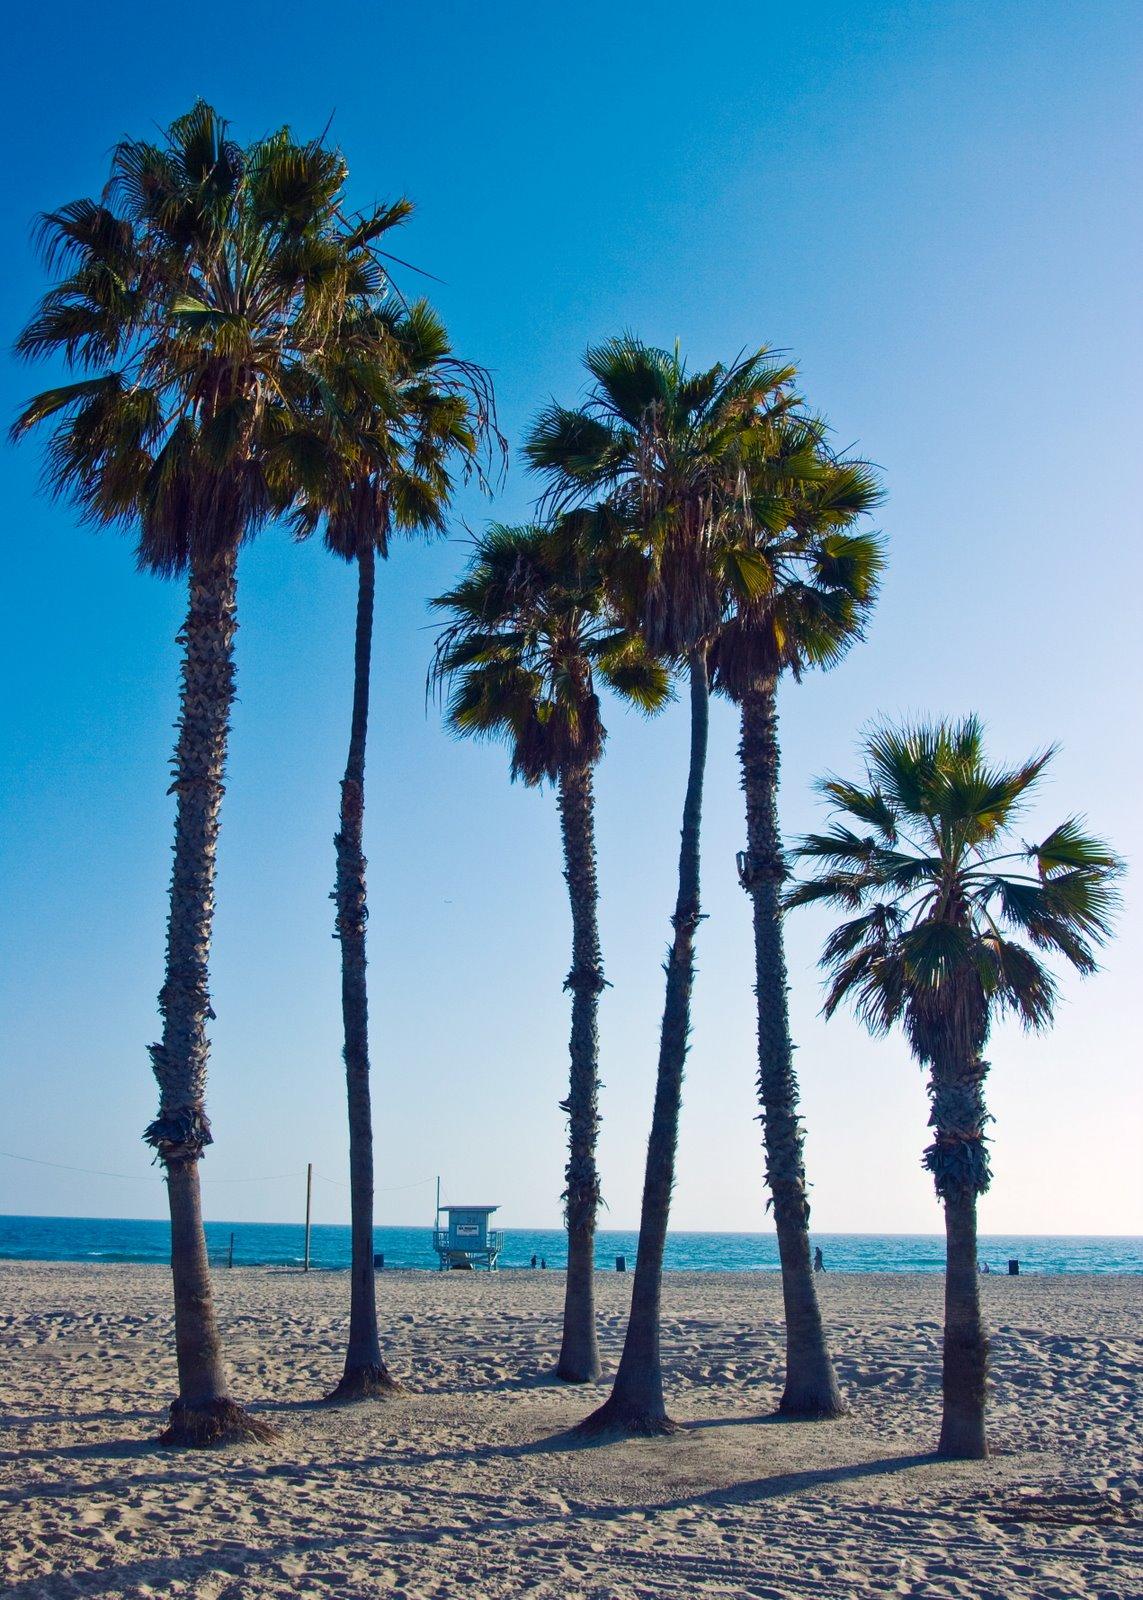 Luxury Home Gardens Beach Palm Trees